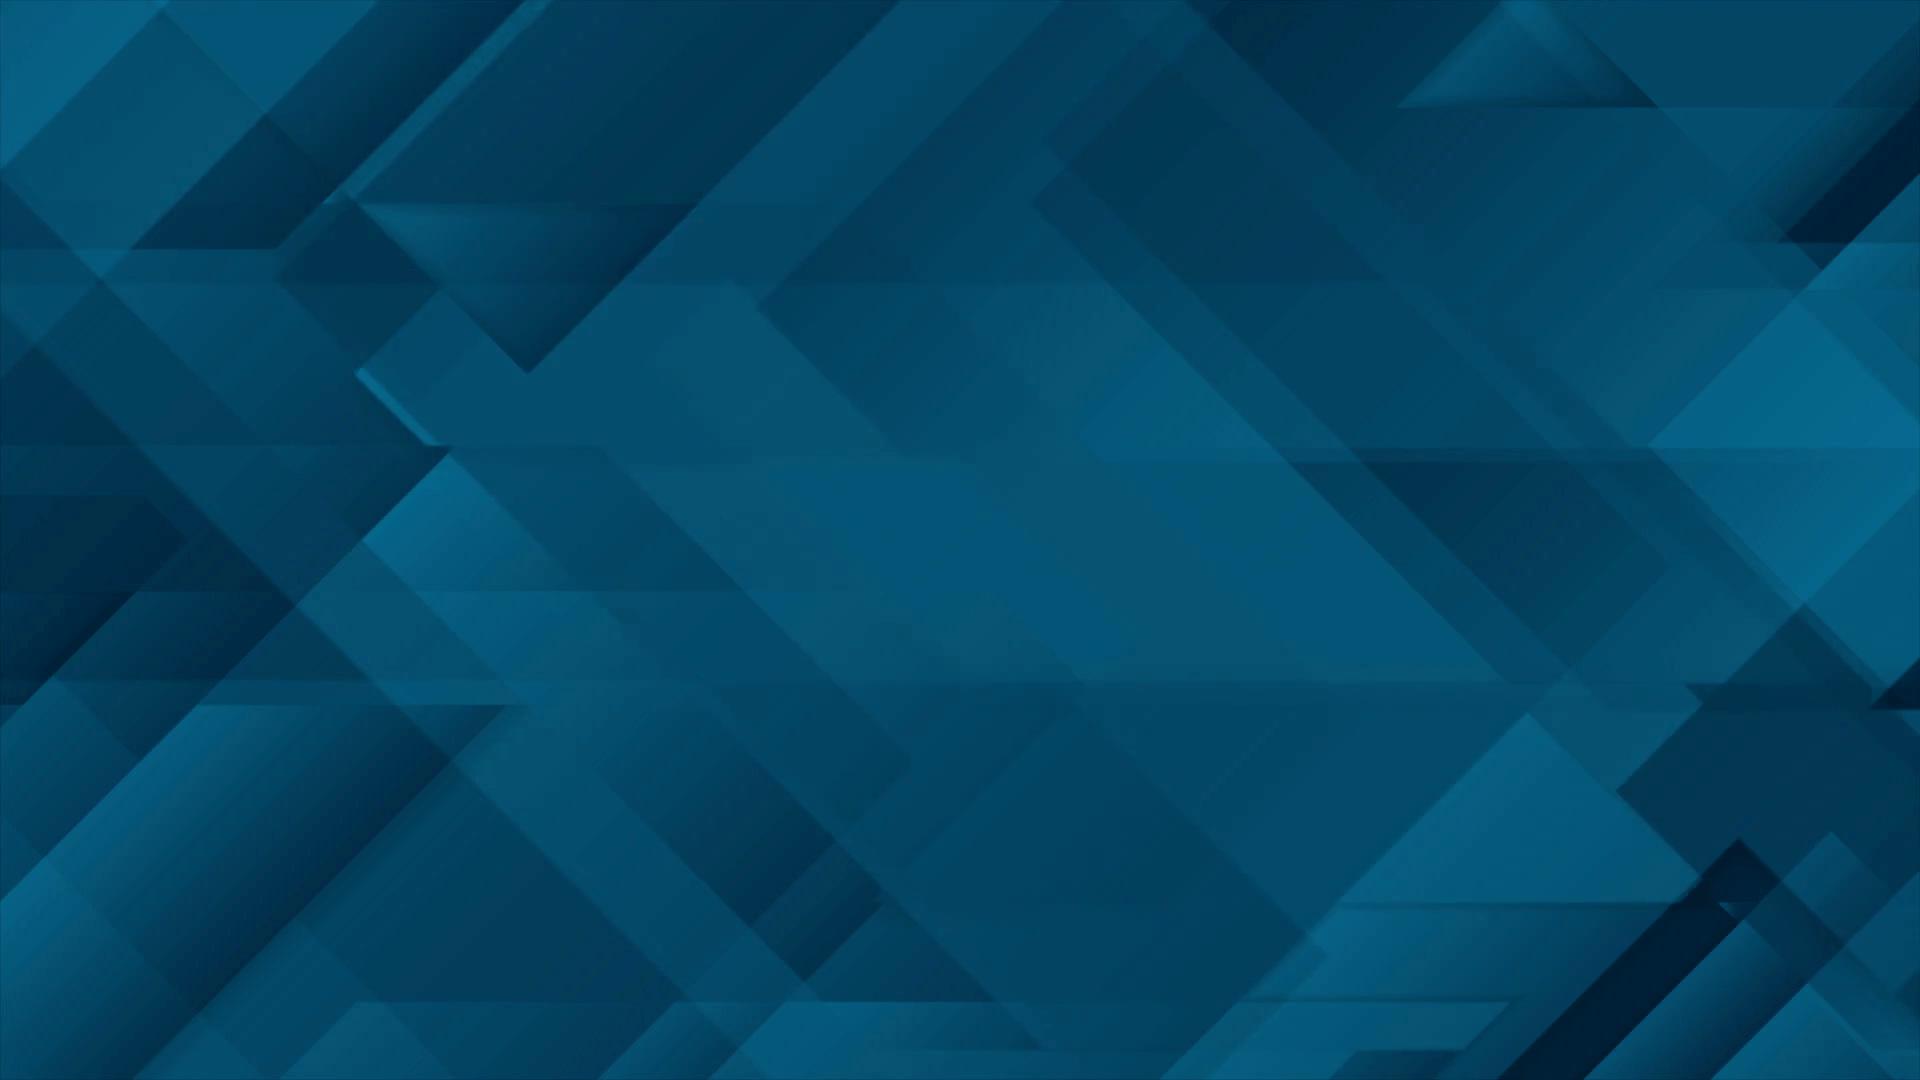 Dark Blue Backgrounds - Wallpaper Cave